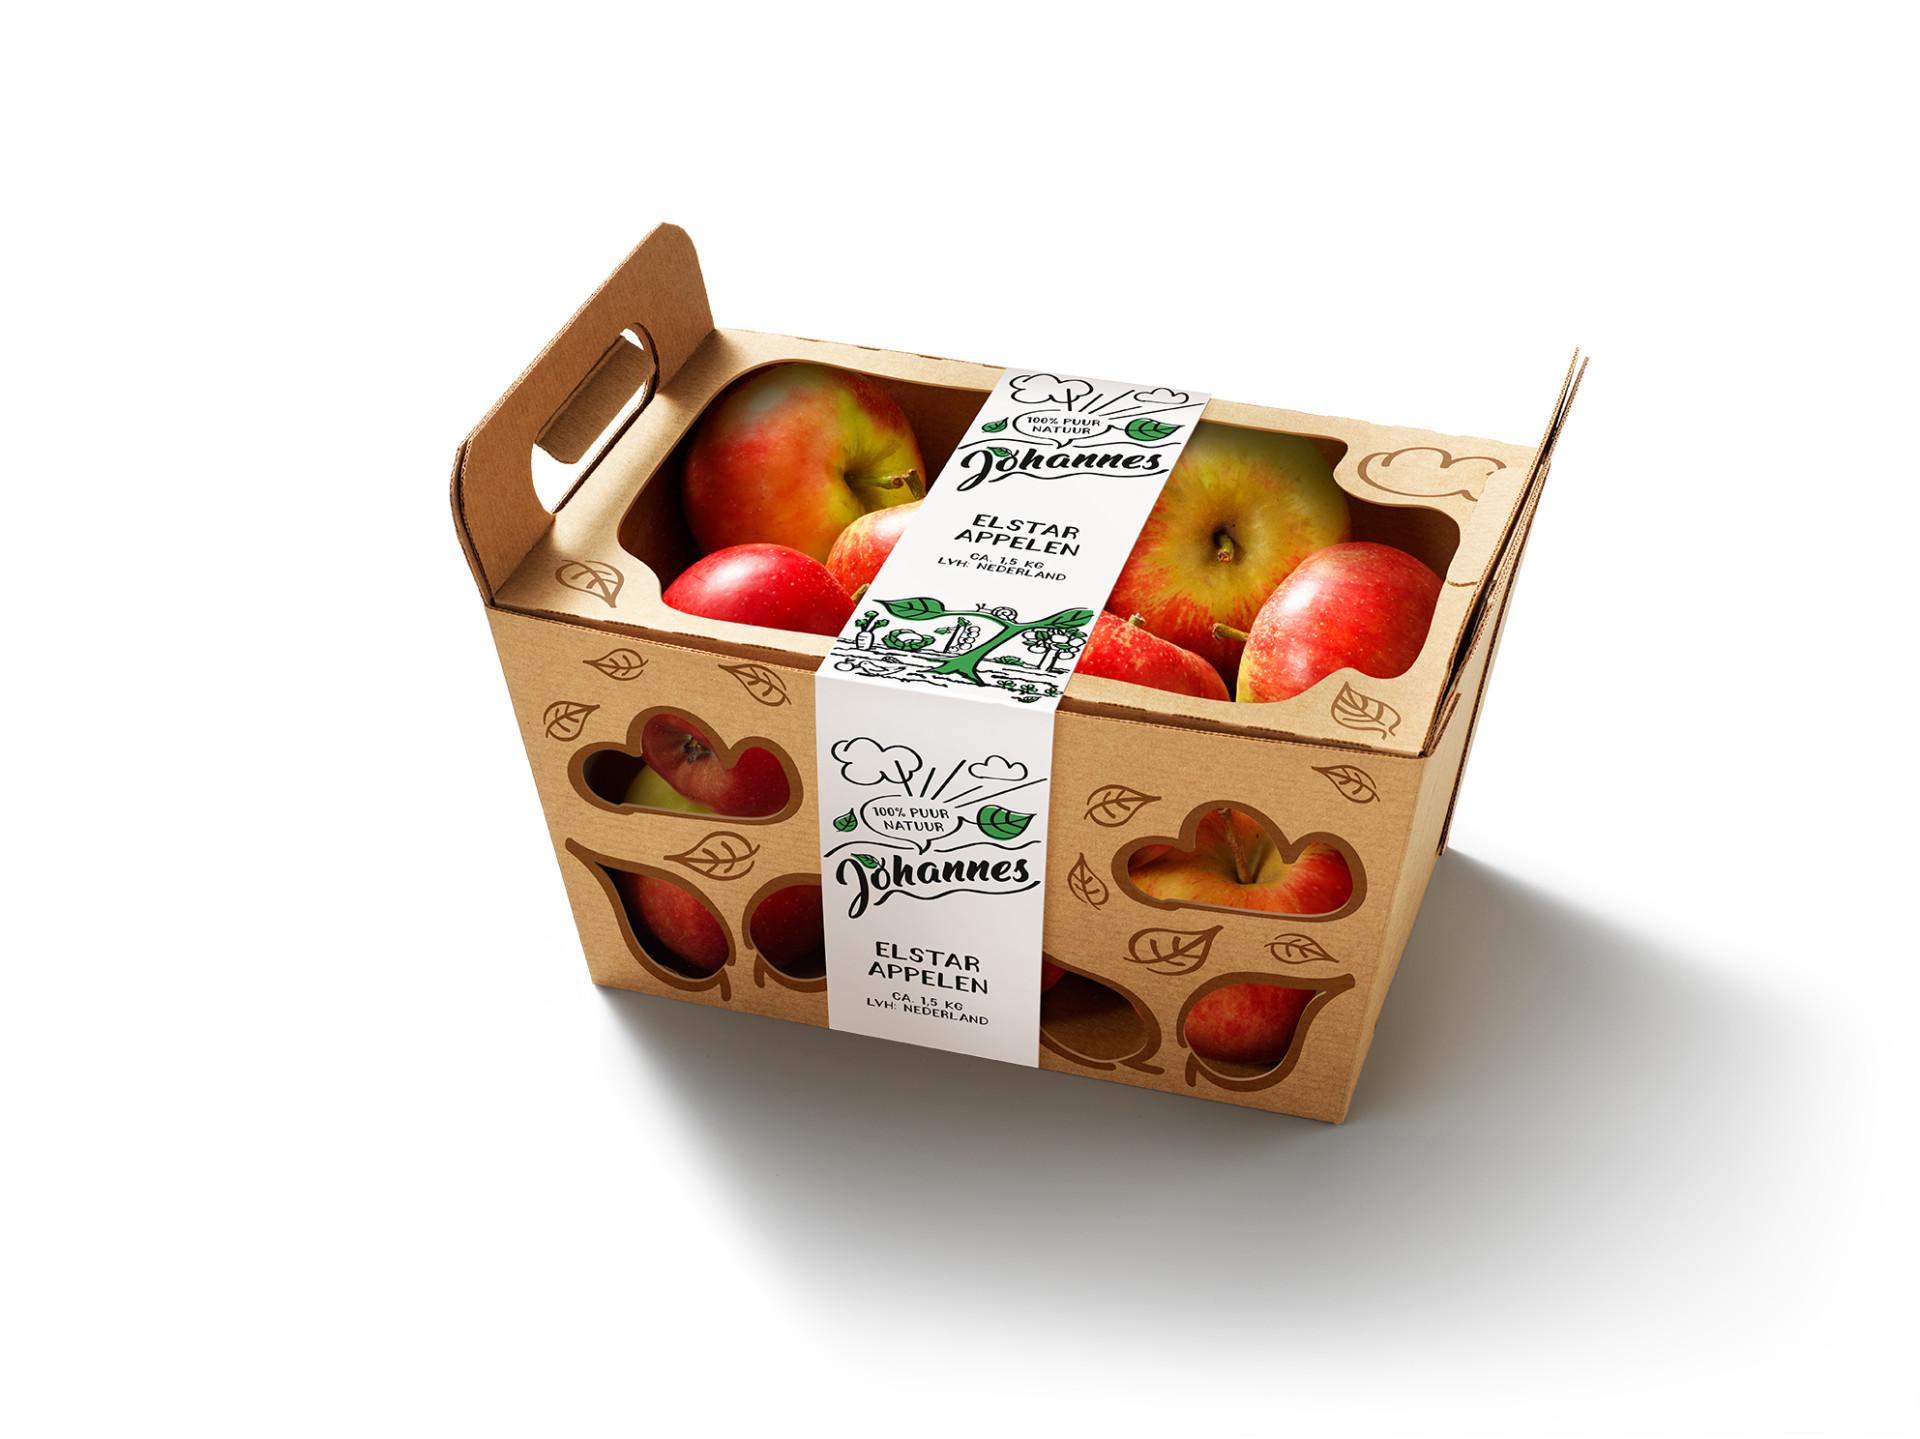 Carton-tray-packaged-apples-964238BAA2